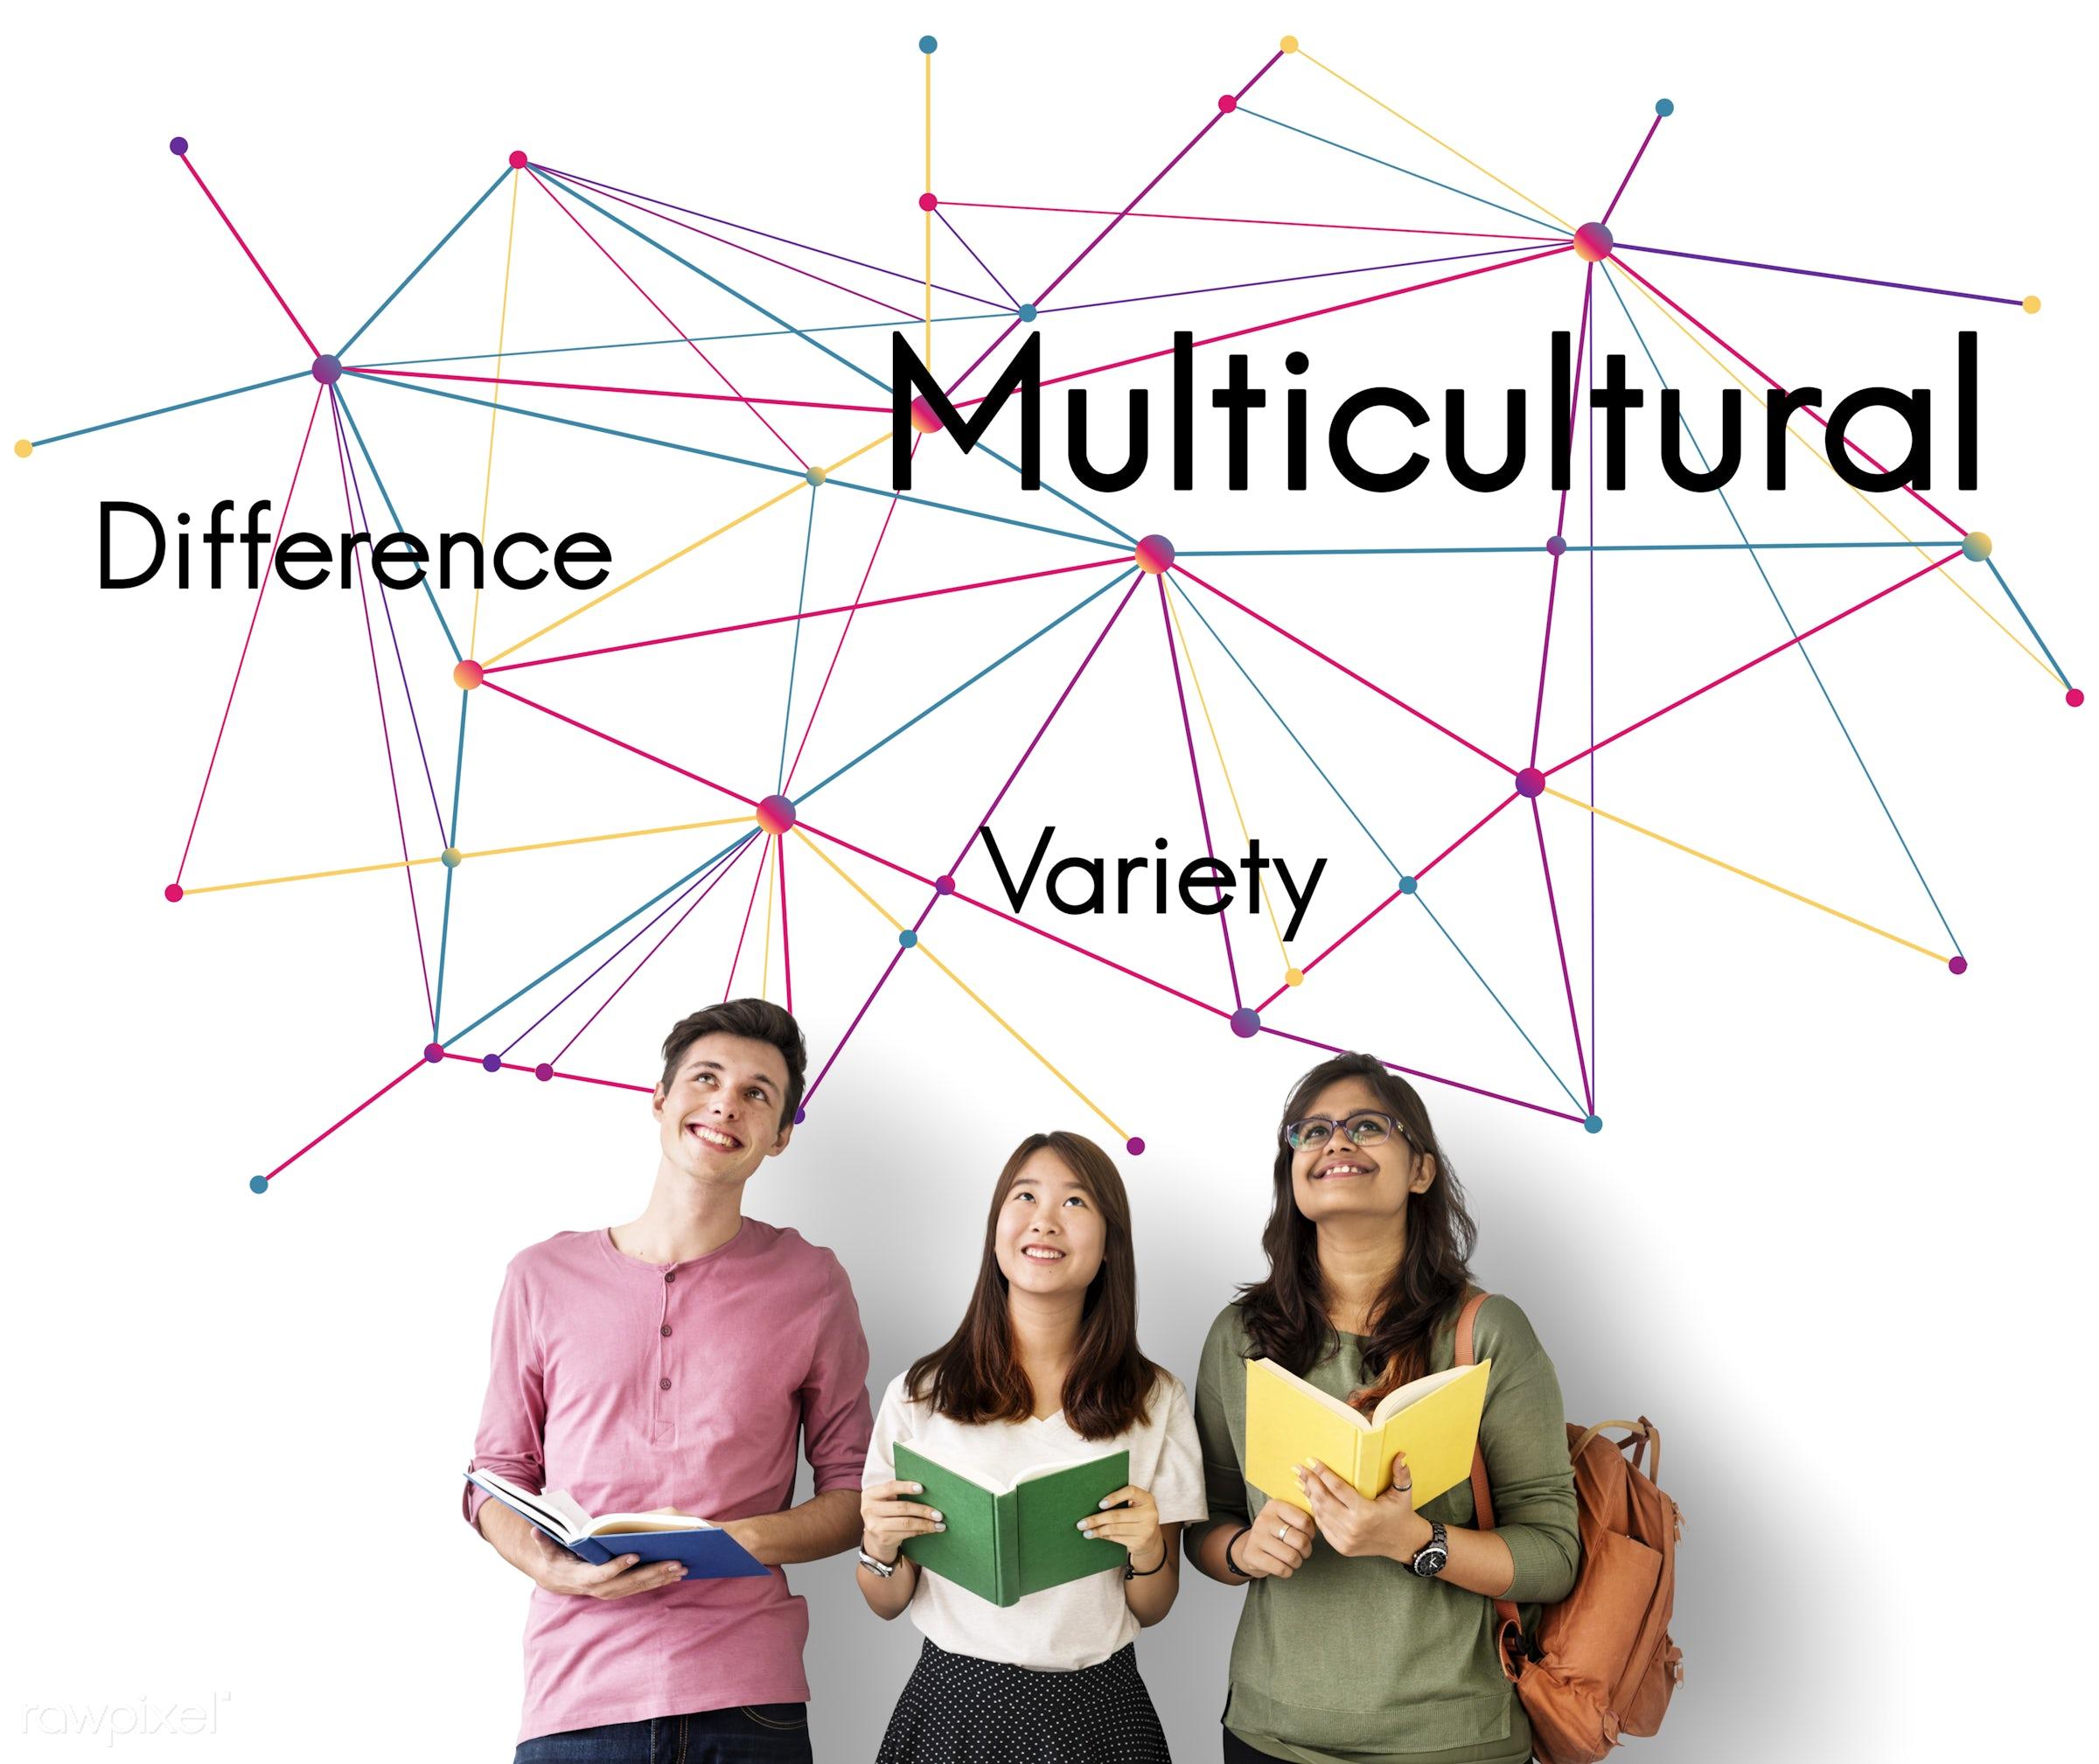 african descent, asian, book, caucasian, communication, community, connected, connection, culture, different, diversity,...